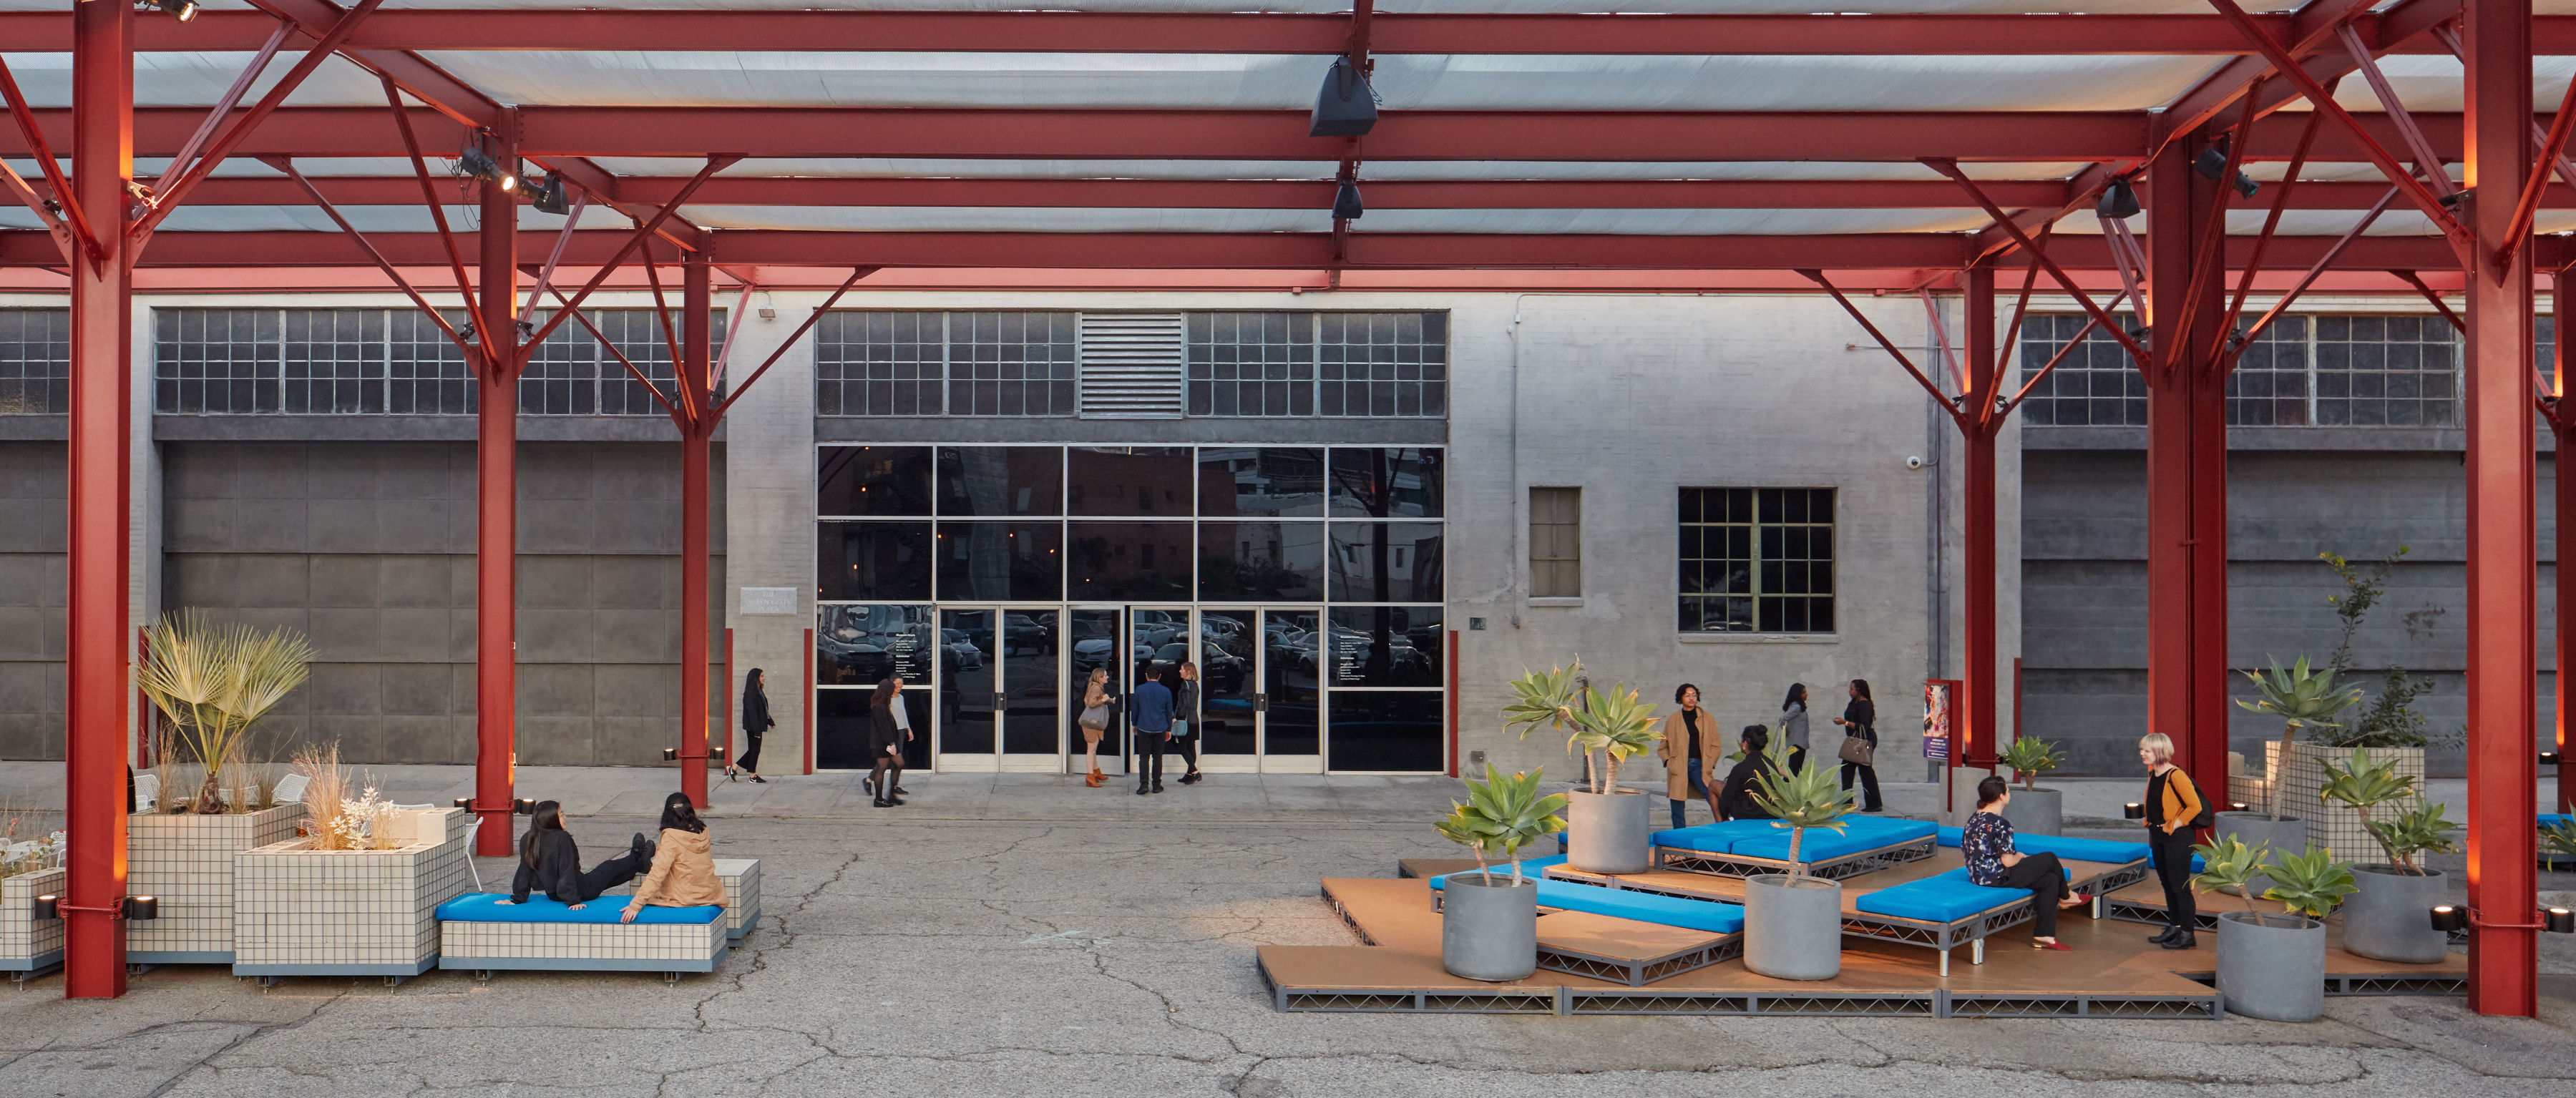 The Geffen Contemporary at MOCA, photo by Elon Schoenholz